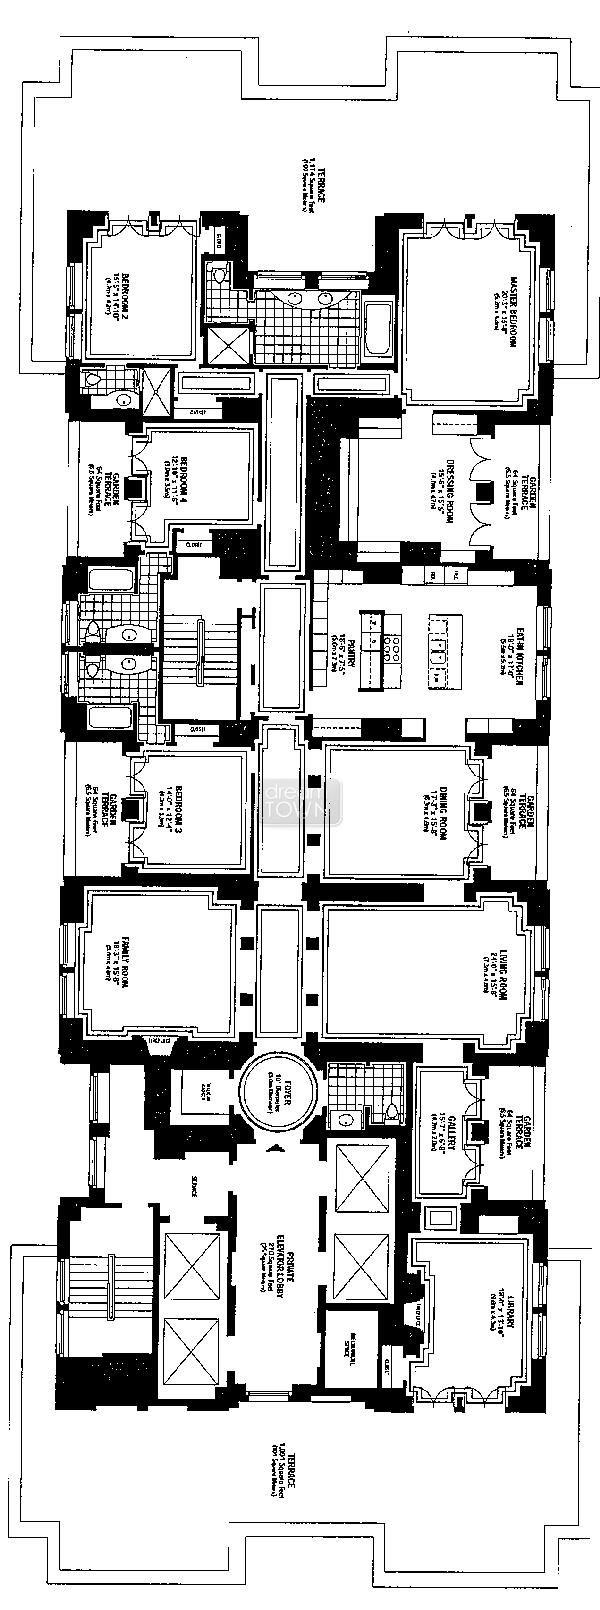 1274 best floor plans images on pinterest floor plans manhattan